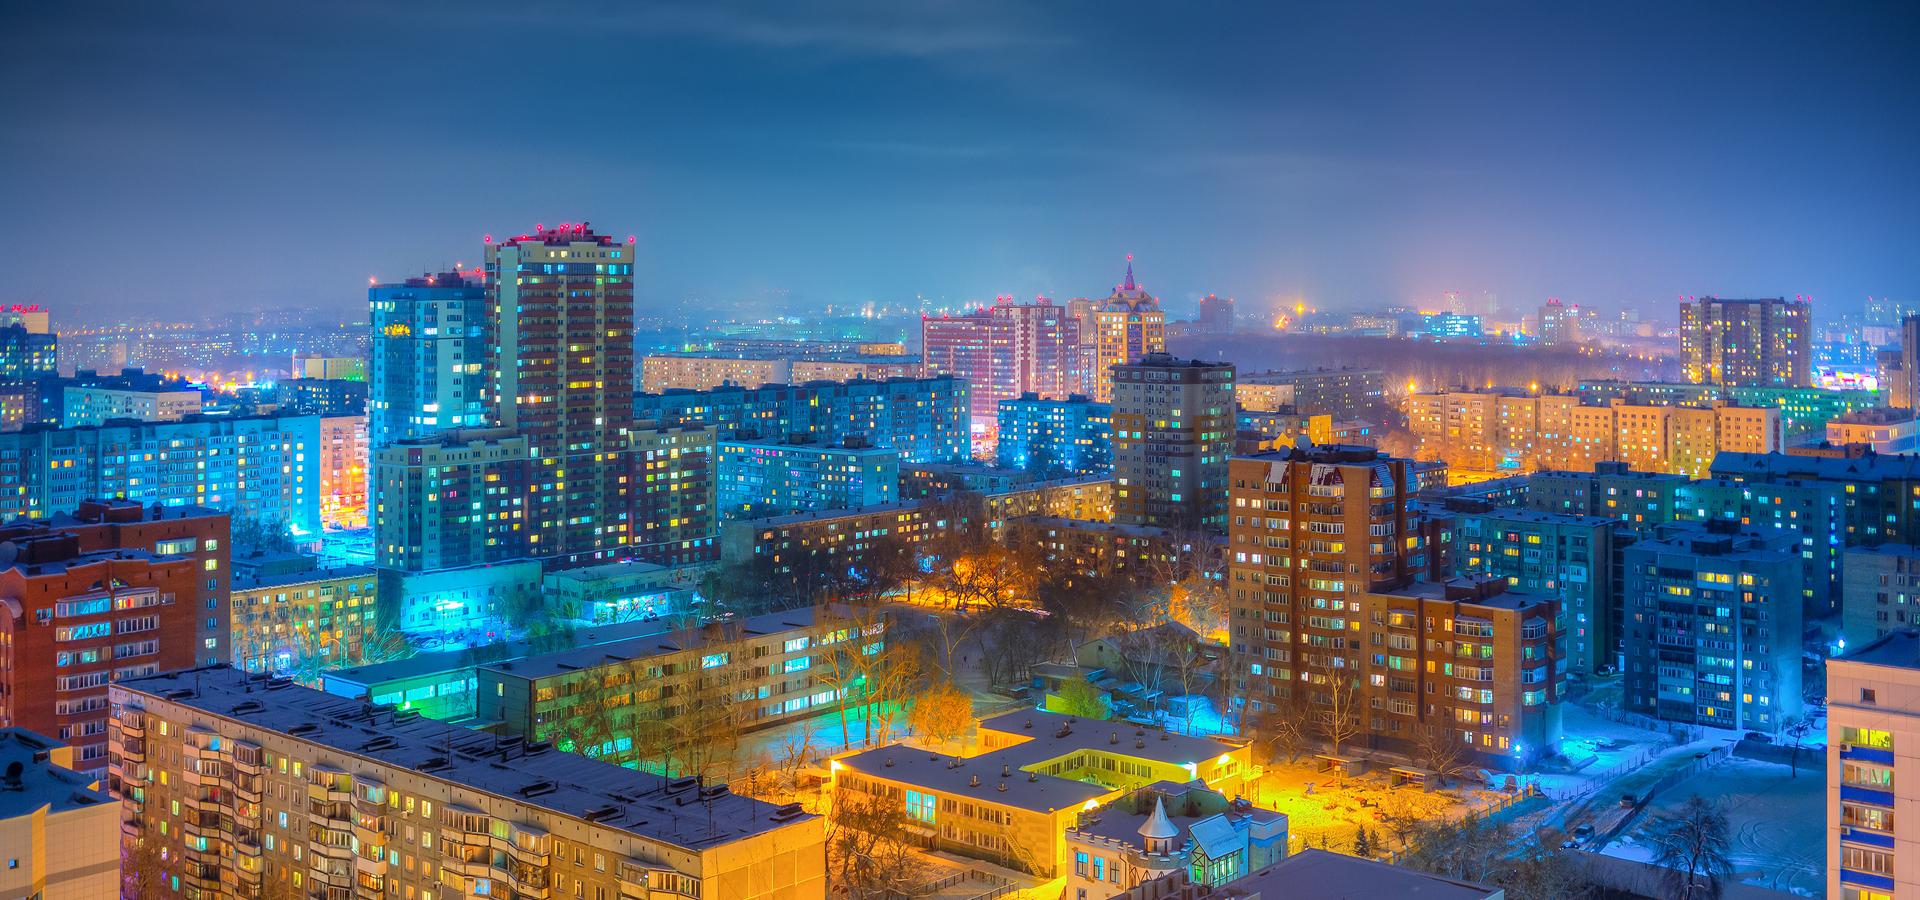 Peer-to-peer advisory in Novosibirsk, Novosibirsk Oblast, Siberia, Russia